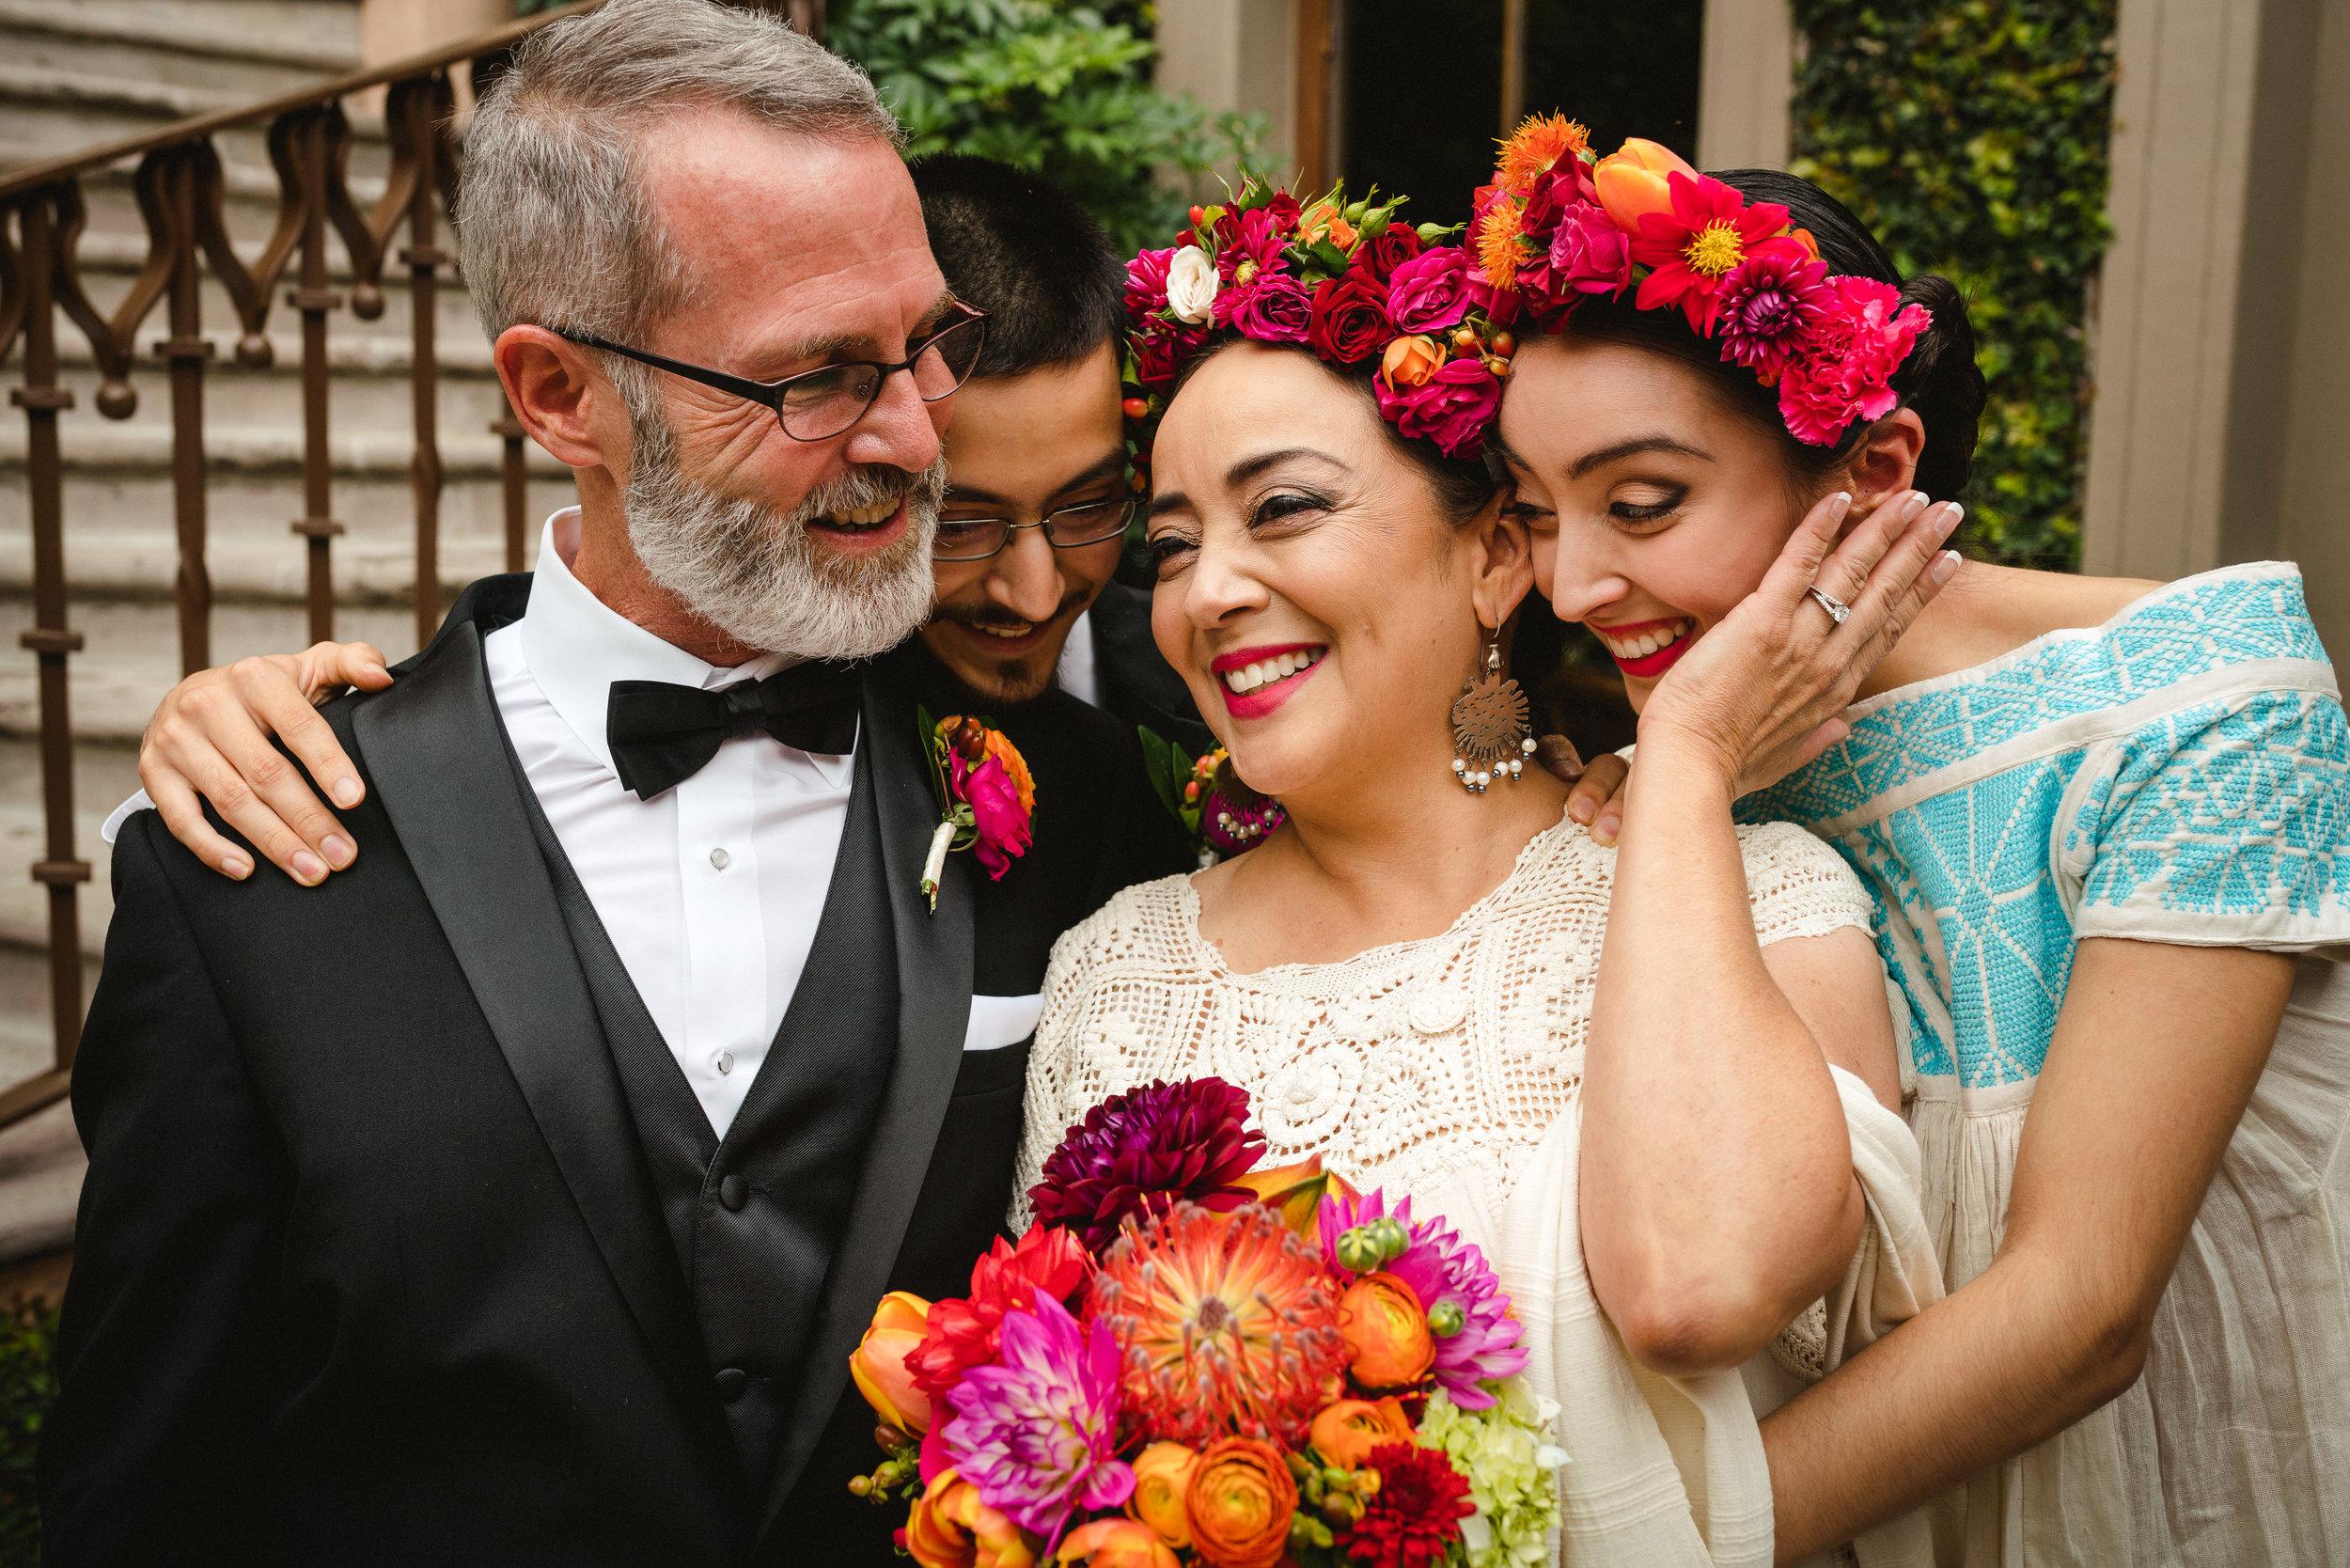 MaurizioSolisBroca-casa-carino-san-miguel-de-allende-wedding-42.jpg